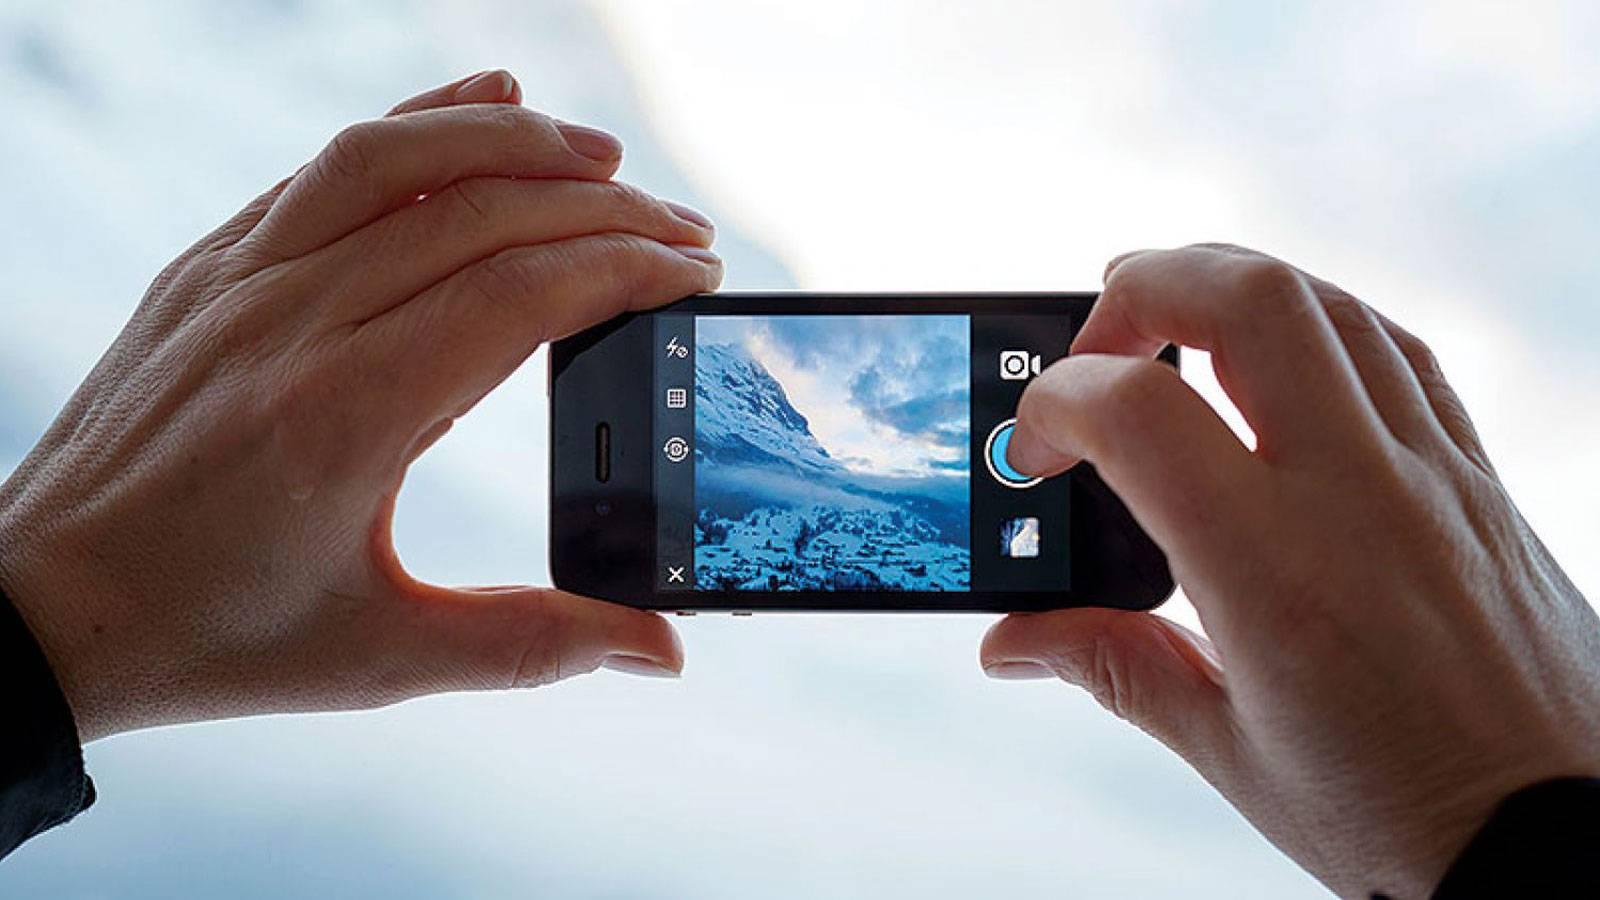 5 Best camera phones under Rs 20,000 in 2017